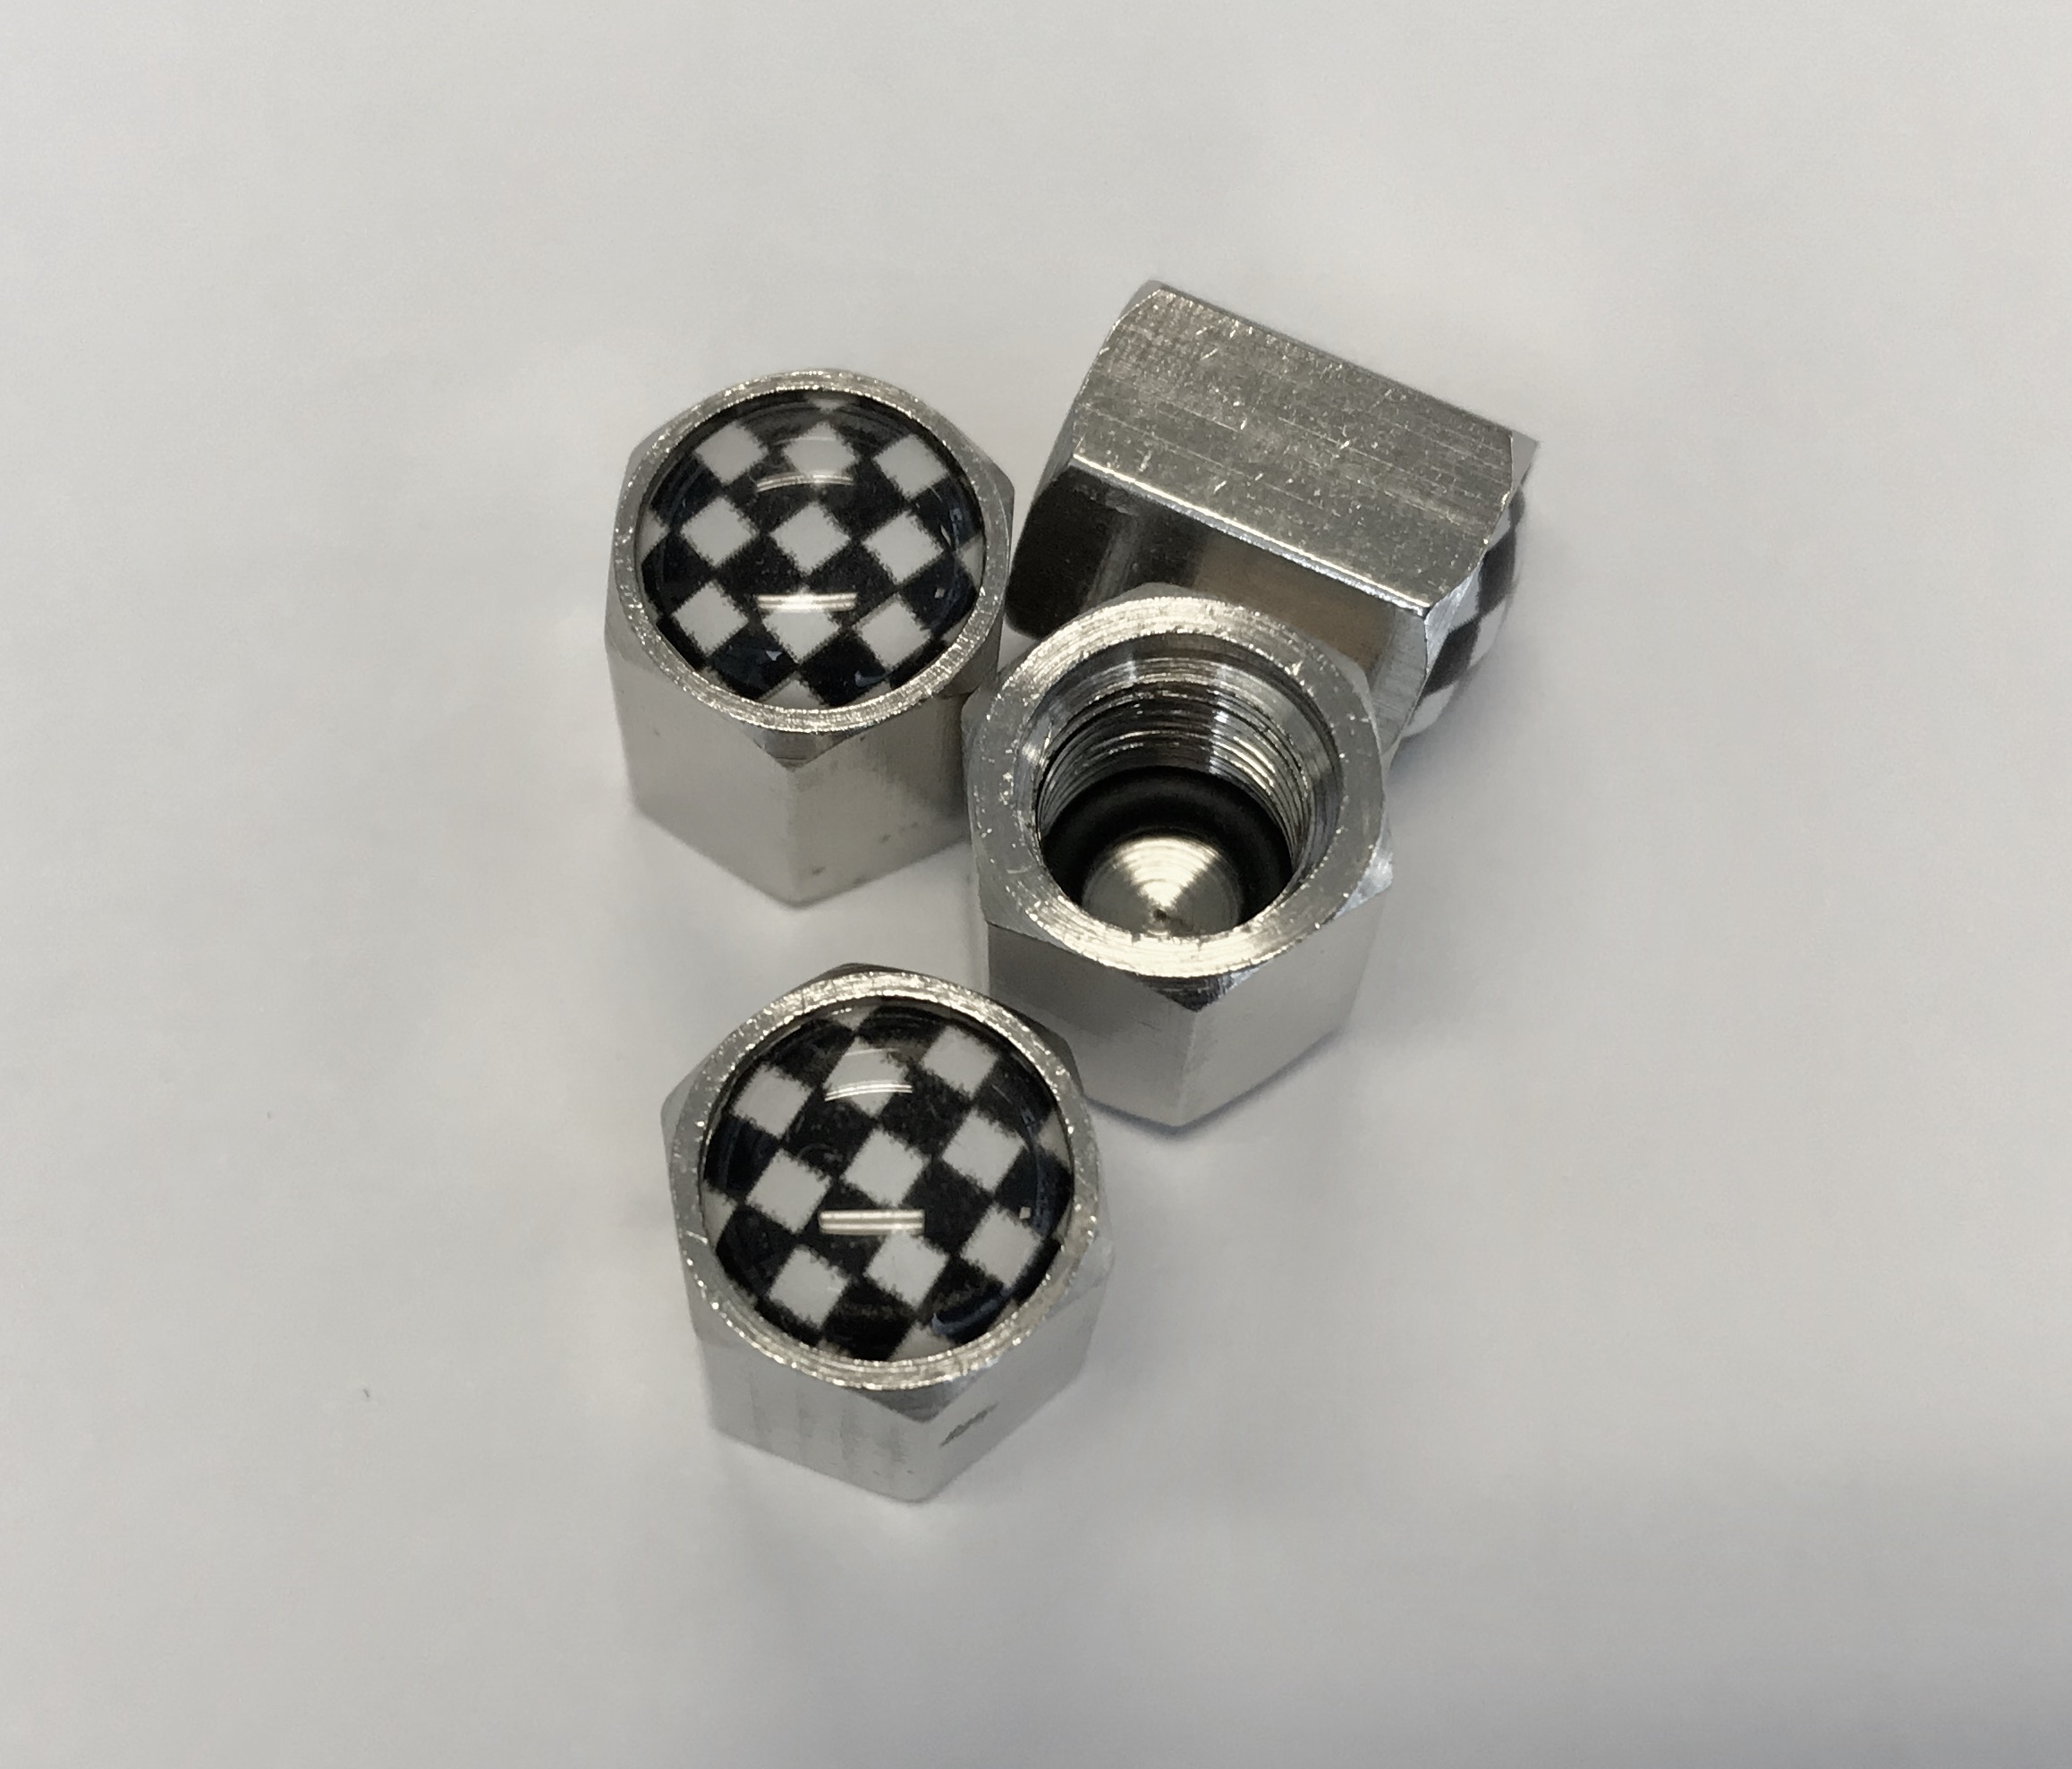 Chequered Flag Tyre Valve Stem Caps